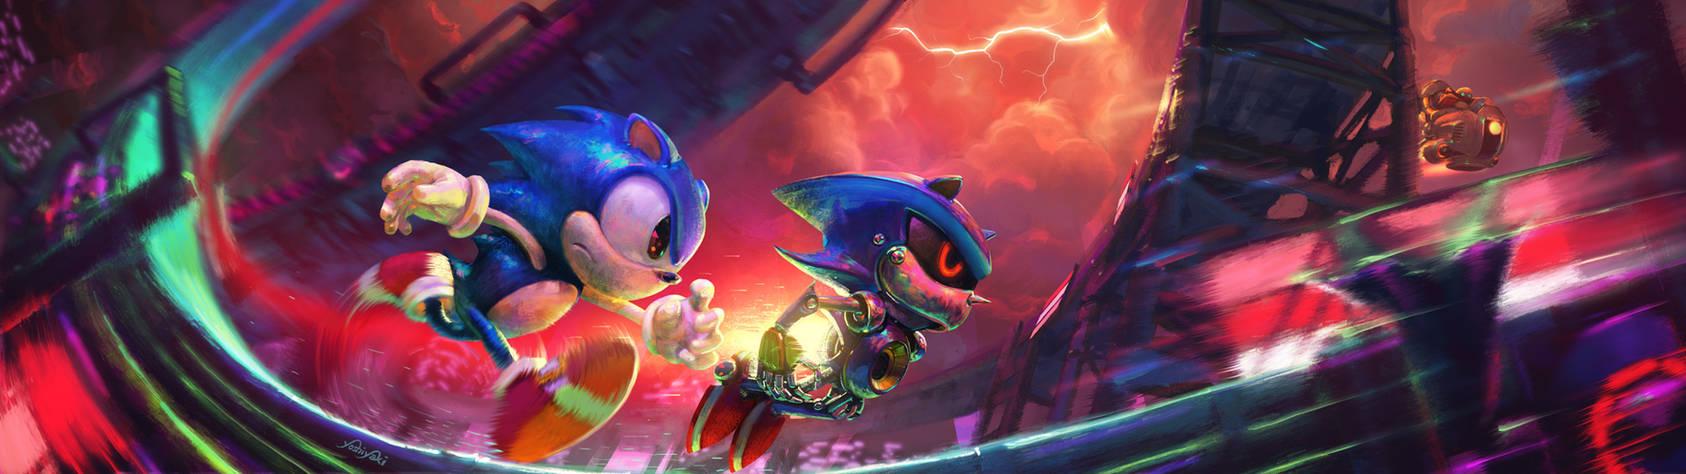 Sonic CD Stardust Speedway Fanart